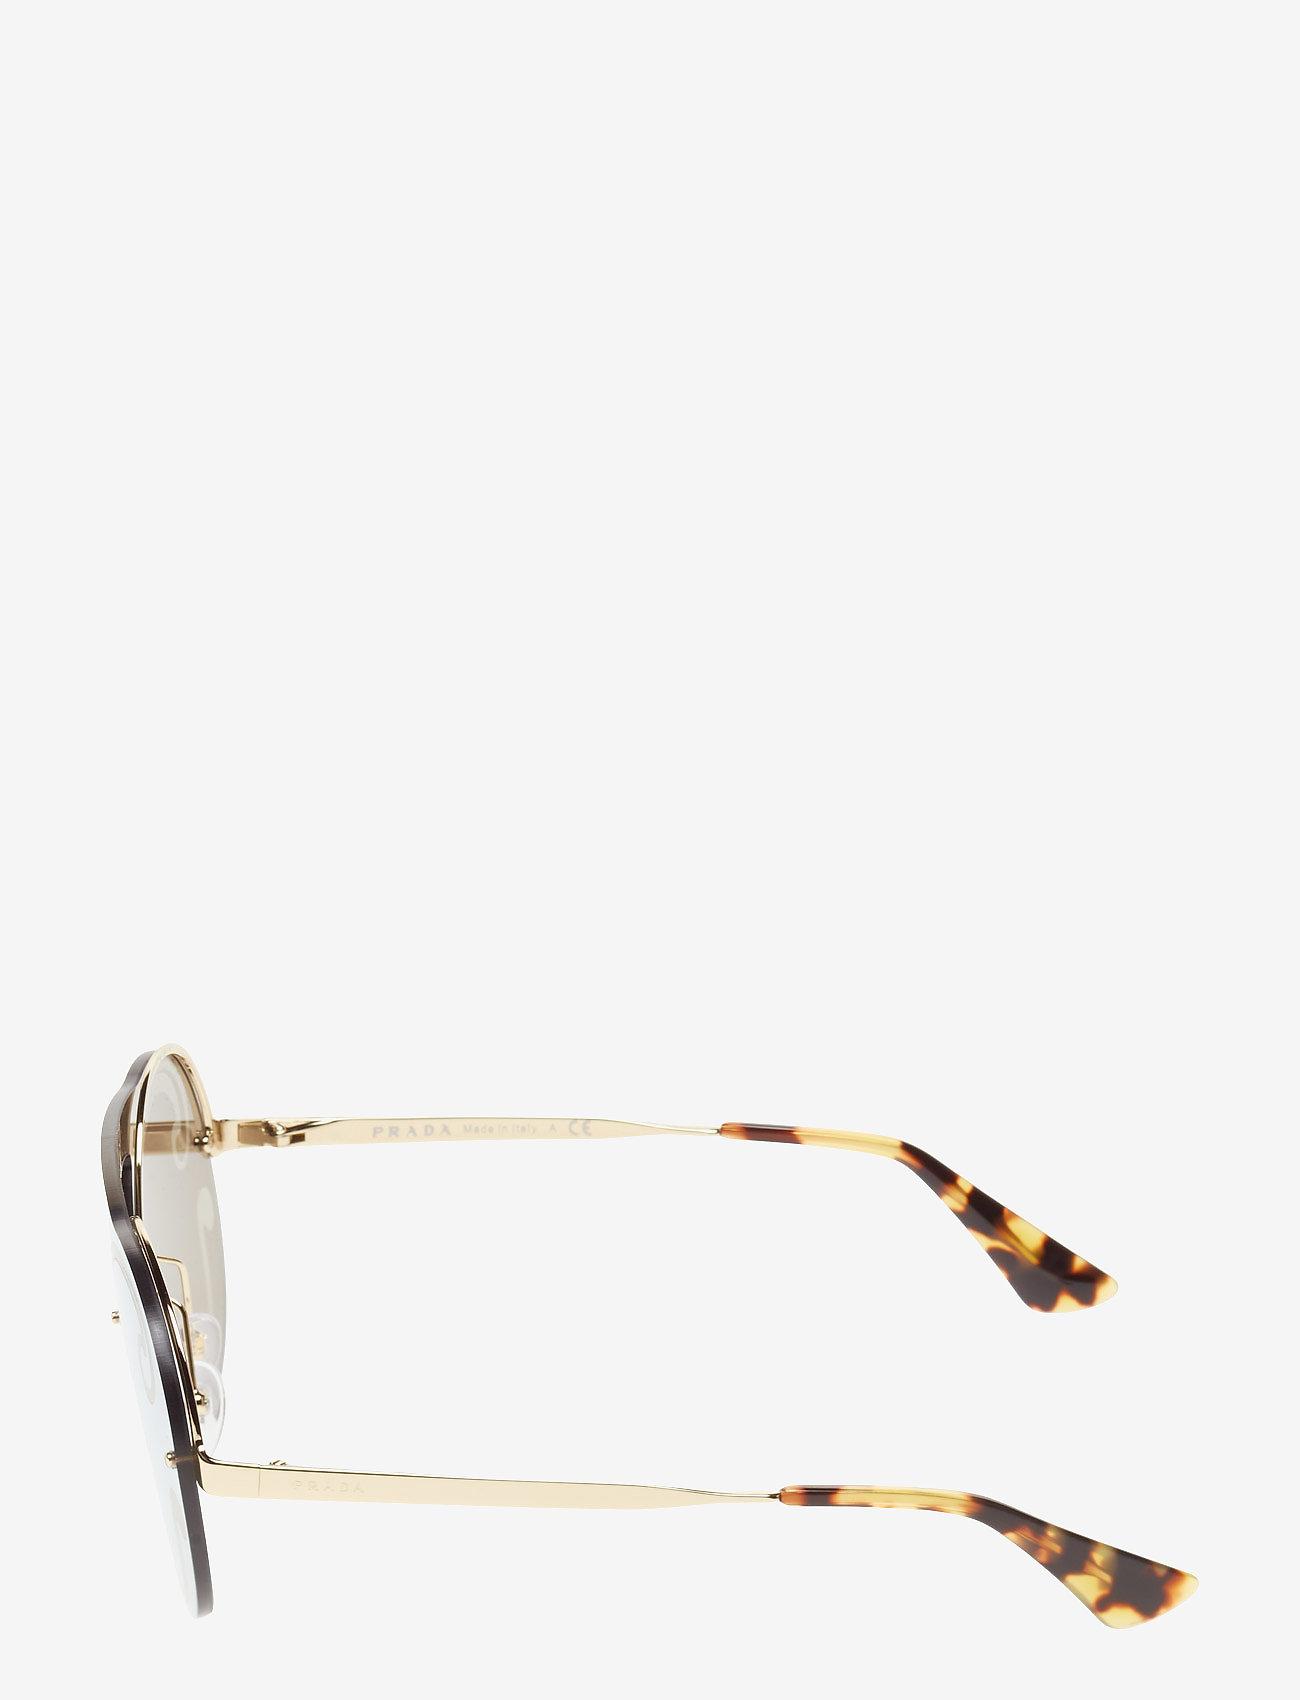 Prada Sunglasses Not Defined - Solglasögon Pale Gold